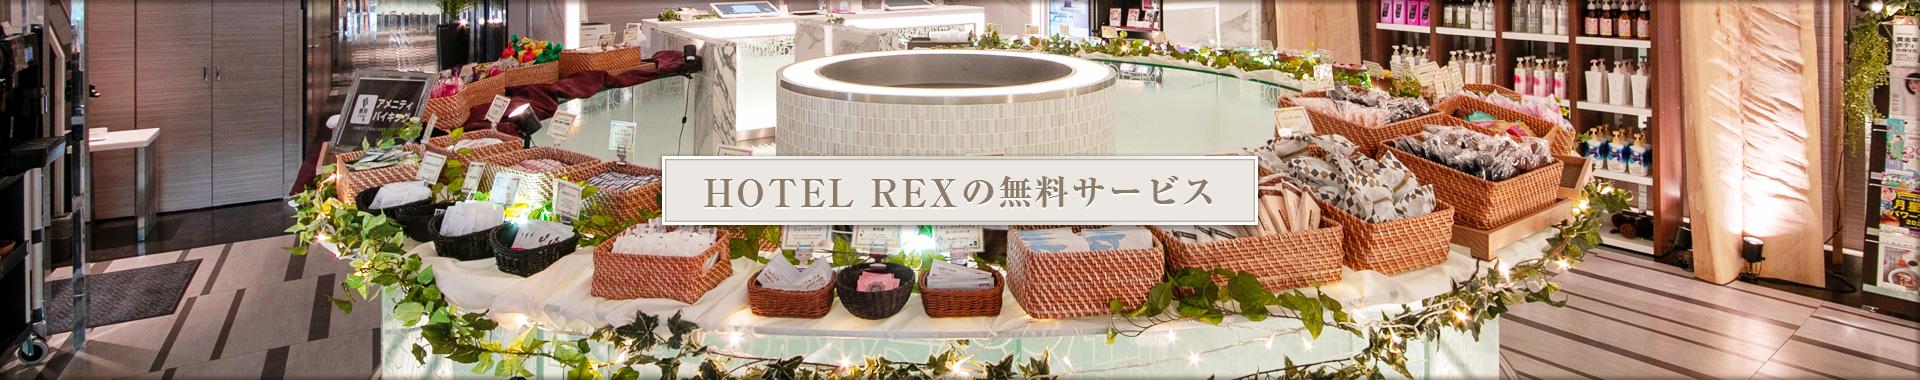 HOTEL REXの無料サービス